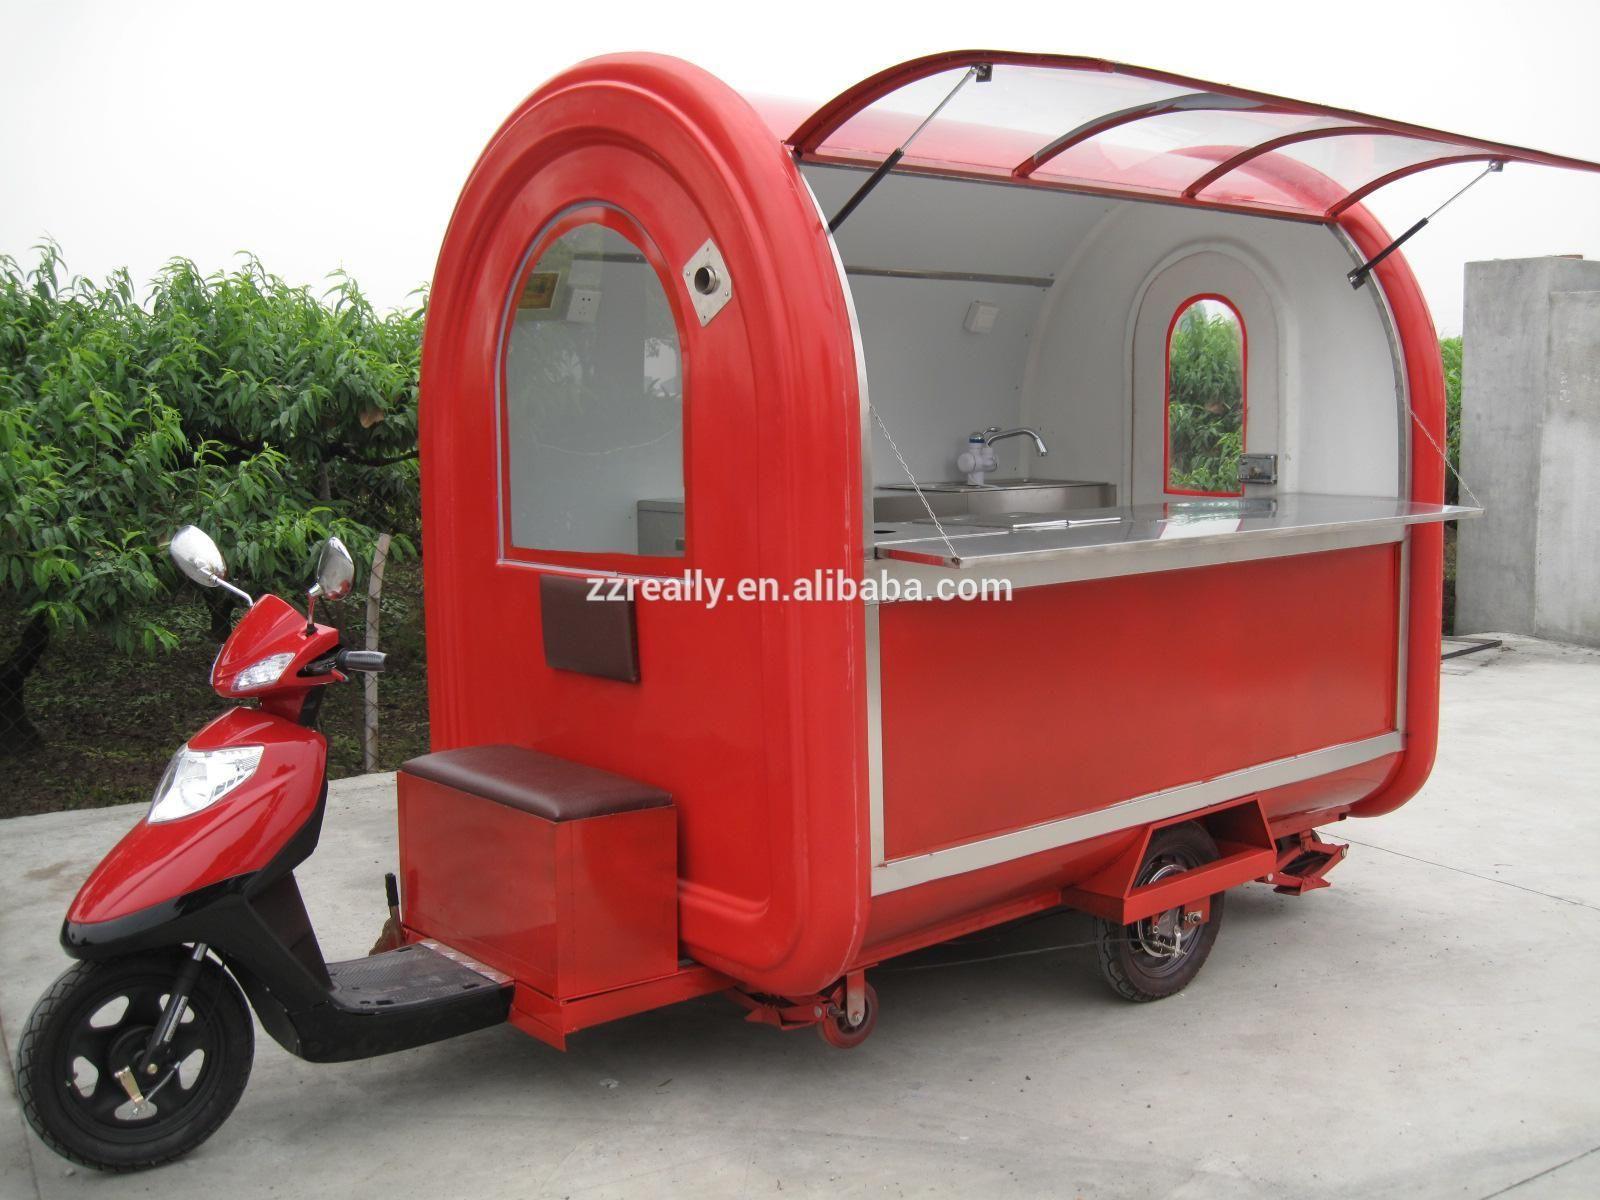 108daa456d1 Electric Food Truck